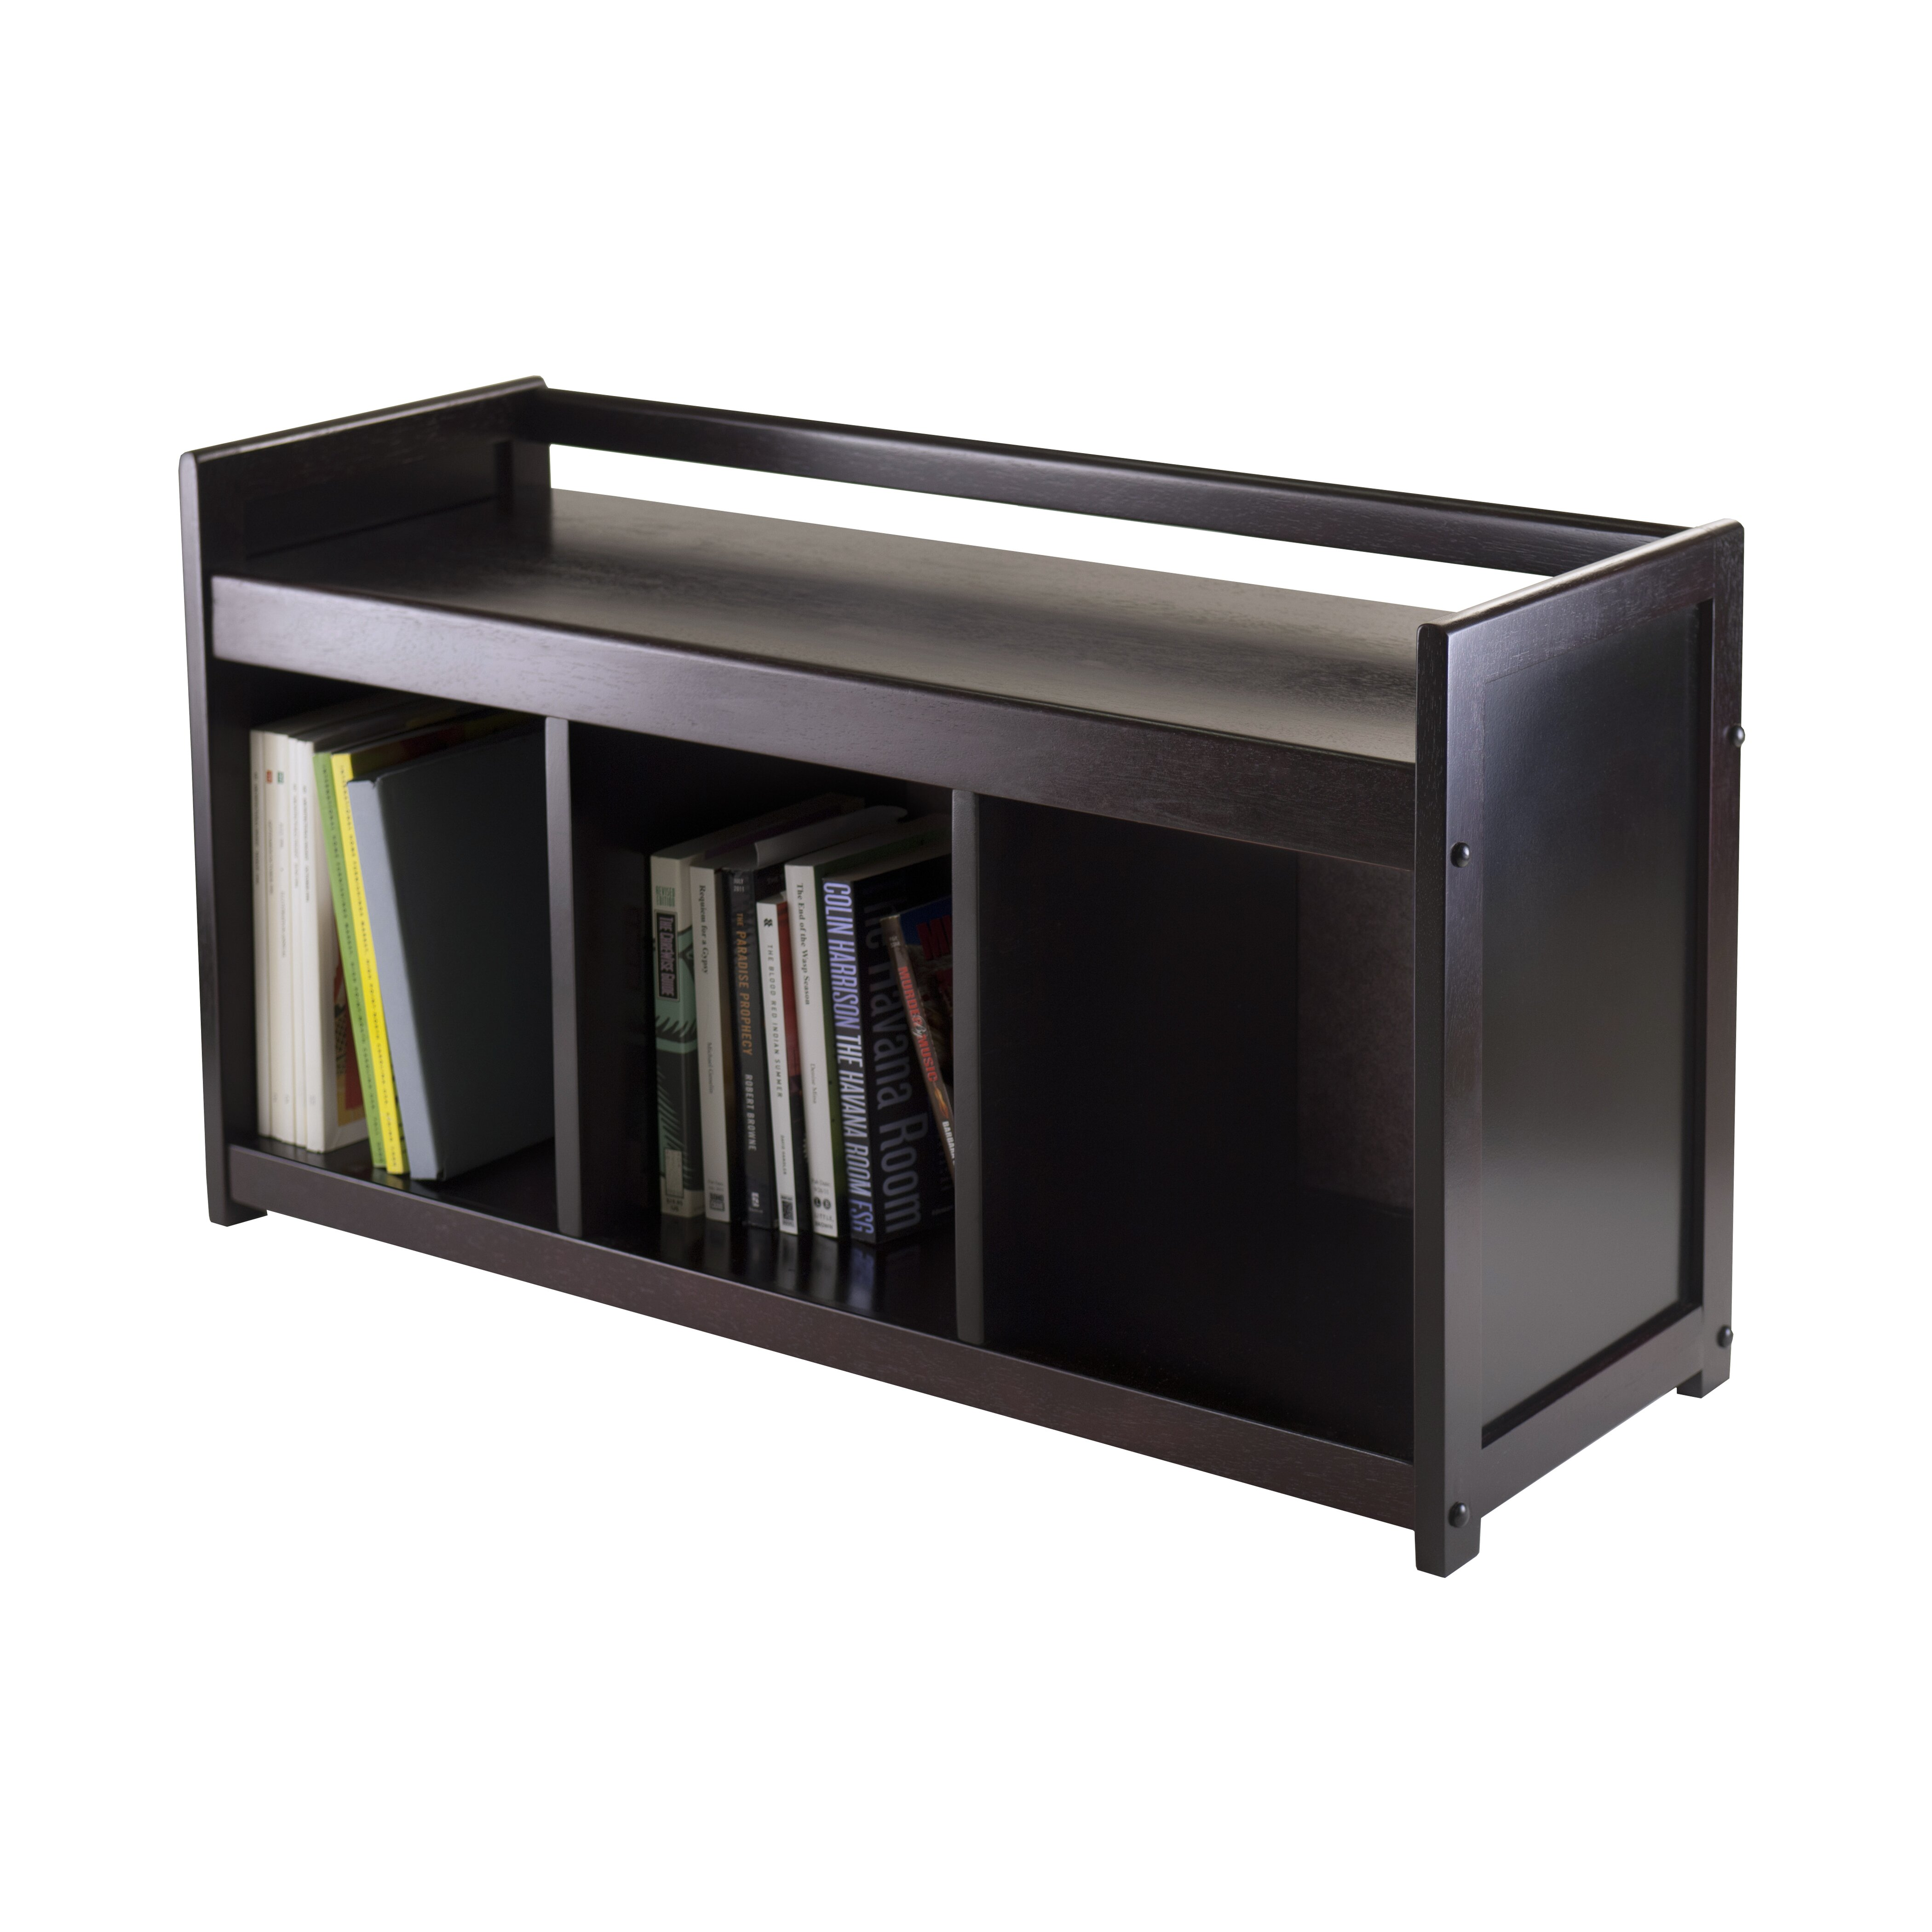 Winsome Addison Wood Storage Bench Amp Reviews Wayfair